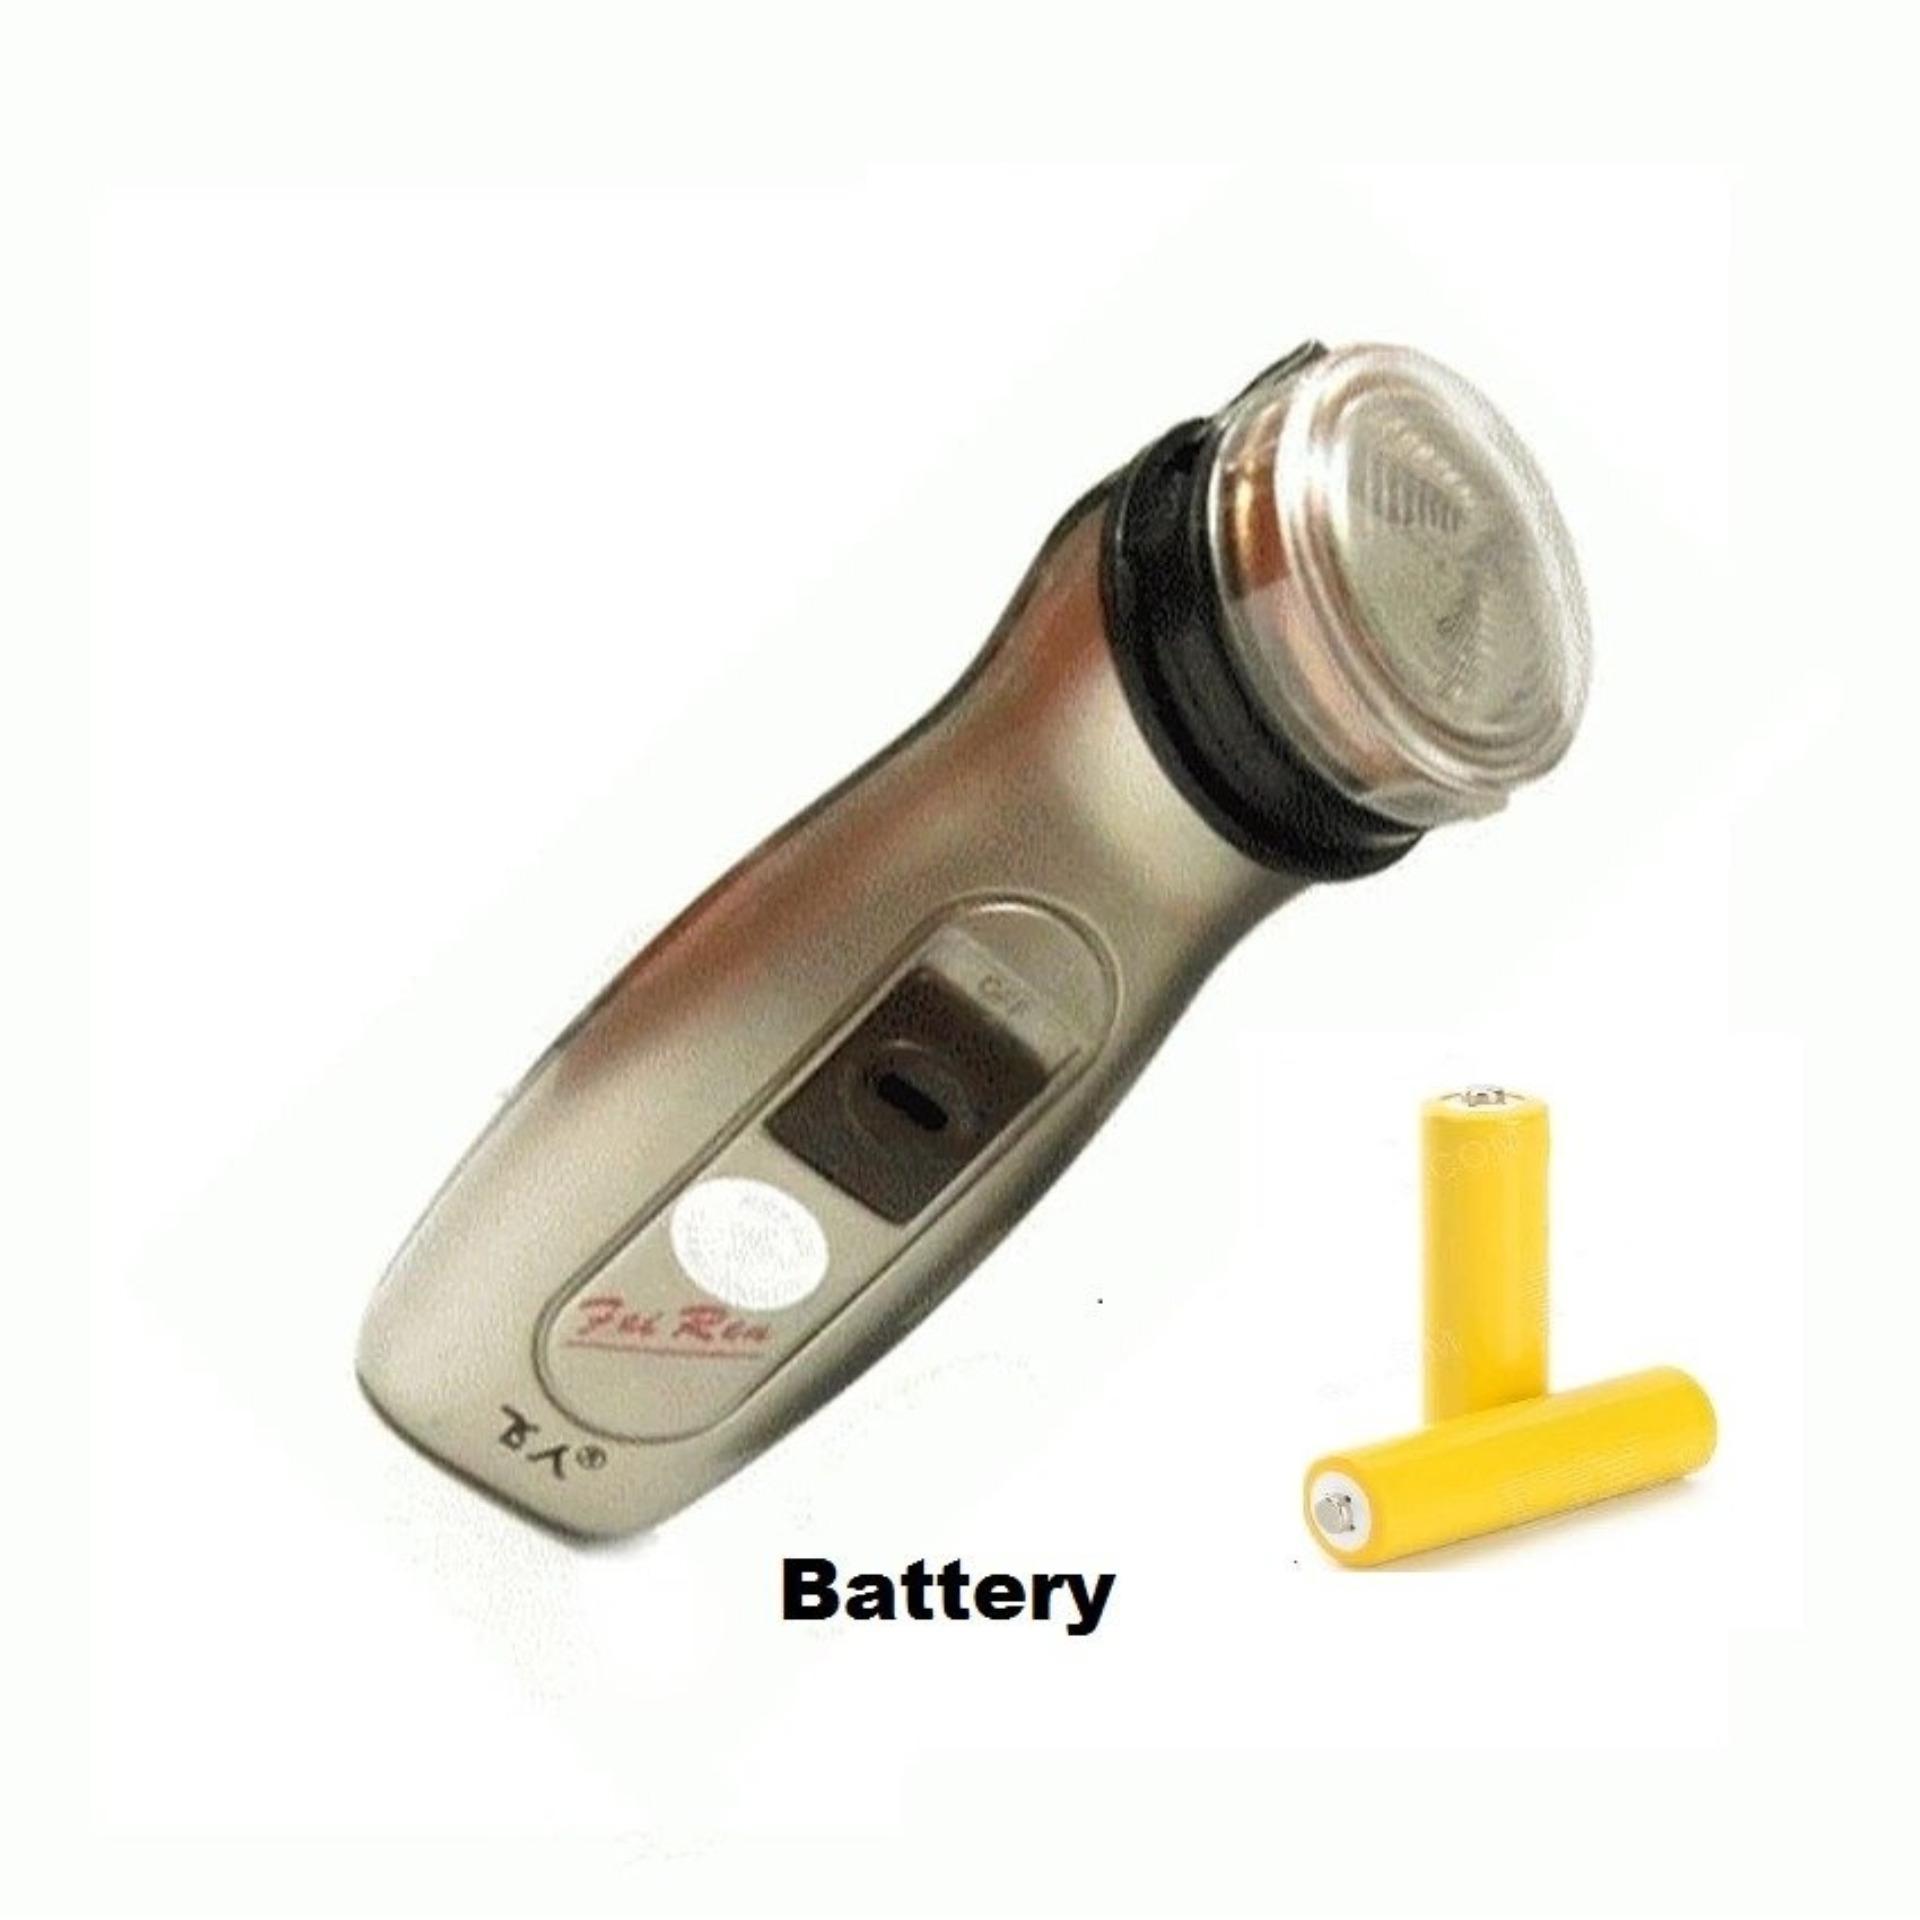 Online Murah Mjstore Feiren Shaver Alat Cukur Jenggot Kumis Philips Pq206 Pq 206 Elektrik Pencukur Bundling Battery